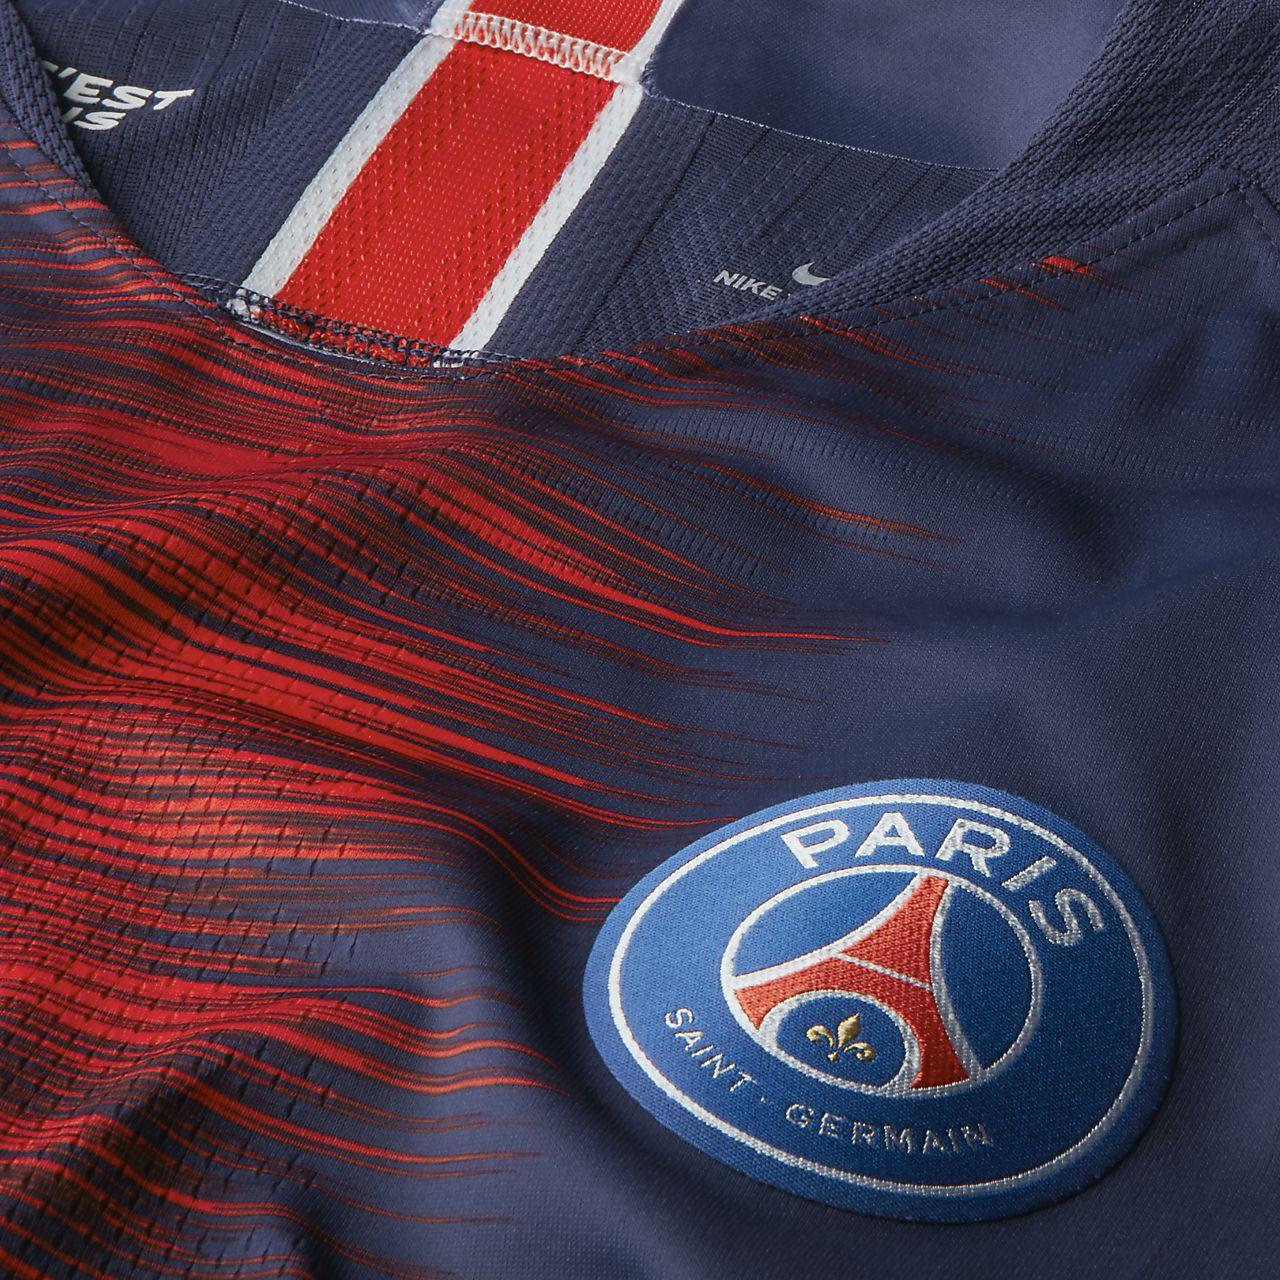 e001e1270b0 2018 19 Paris Saint-Germain Vapor Match Home Men s Football Shirt ...